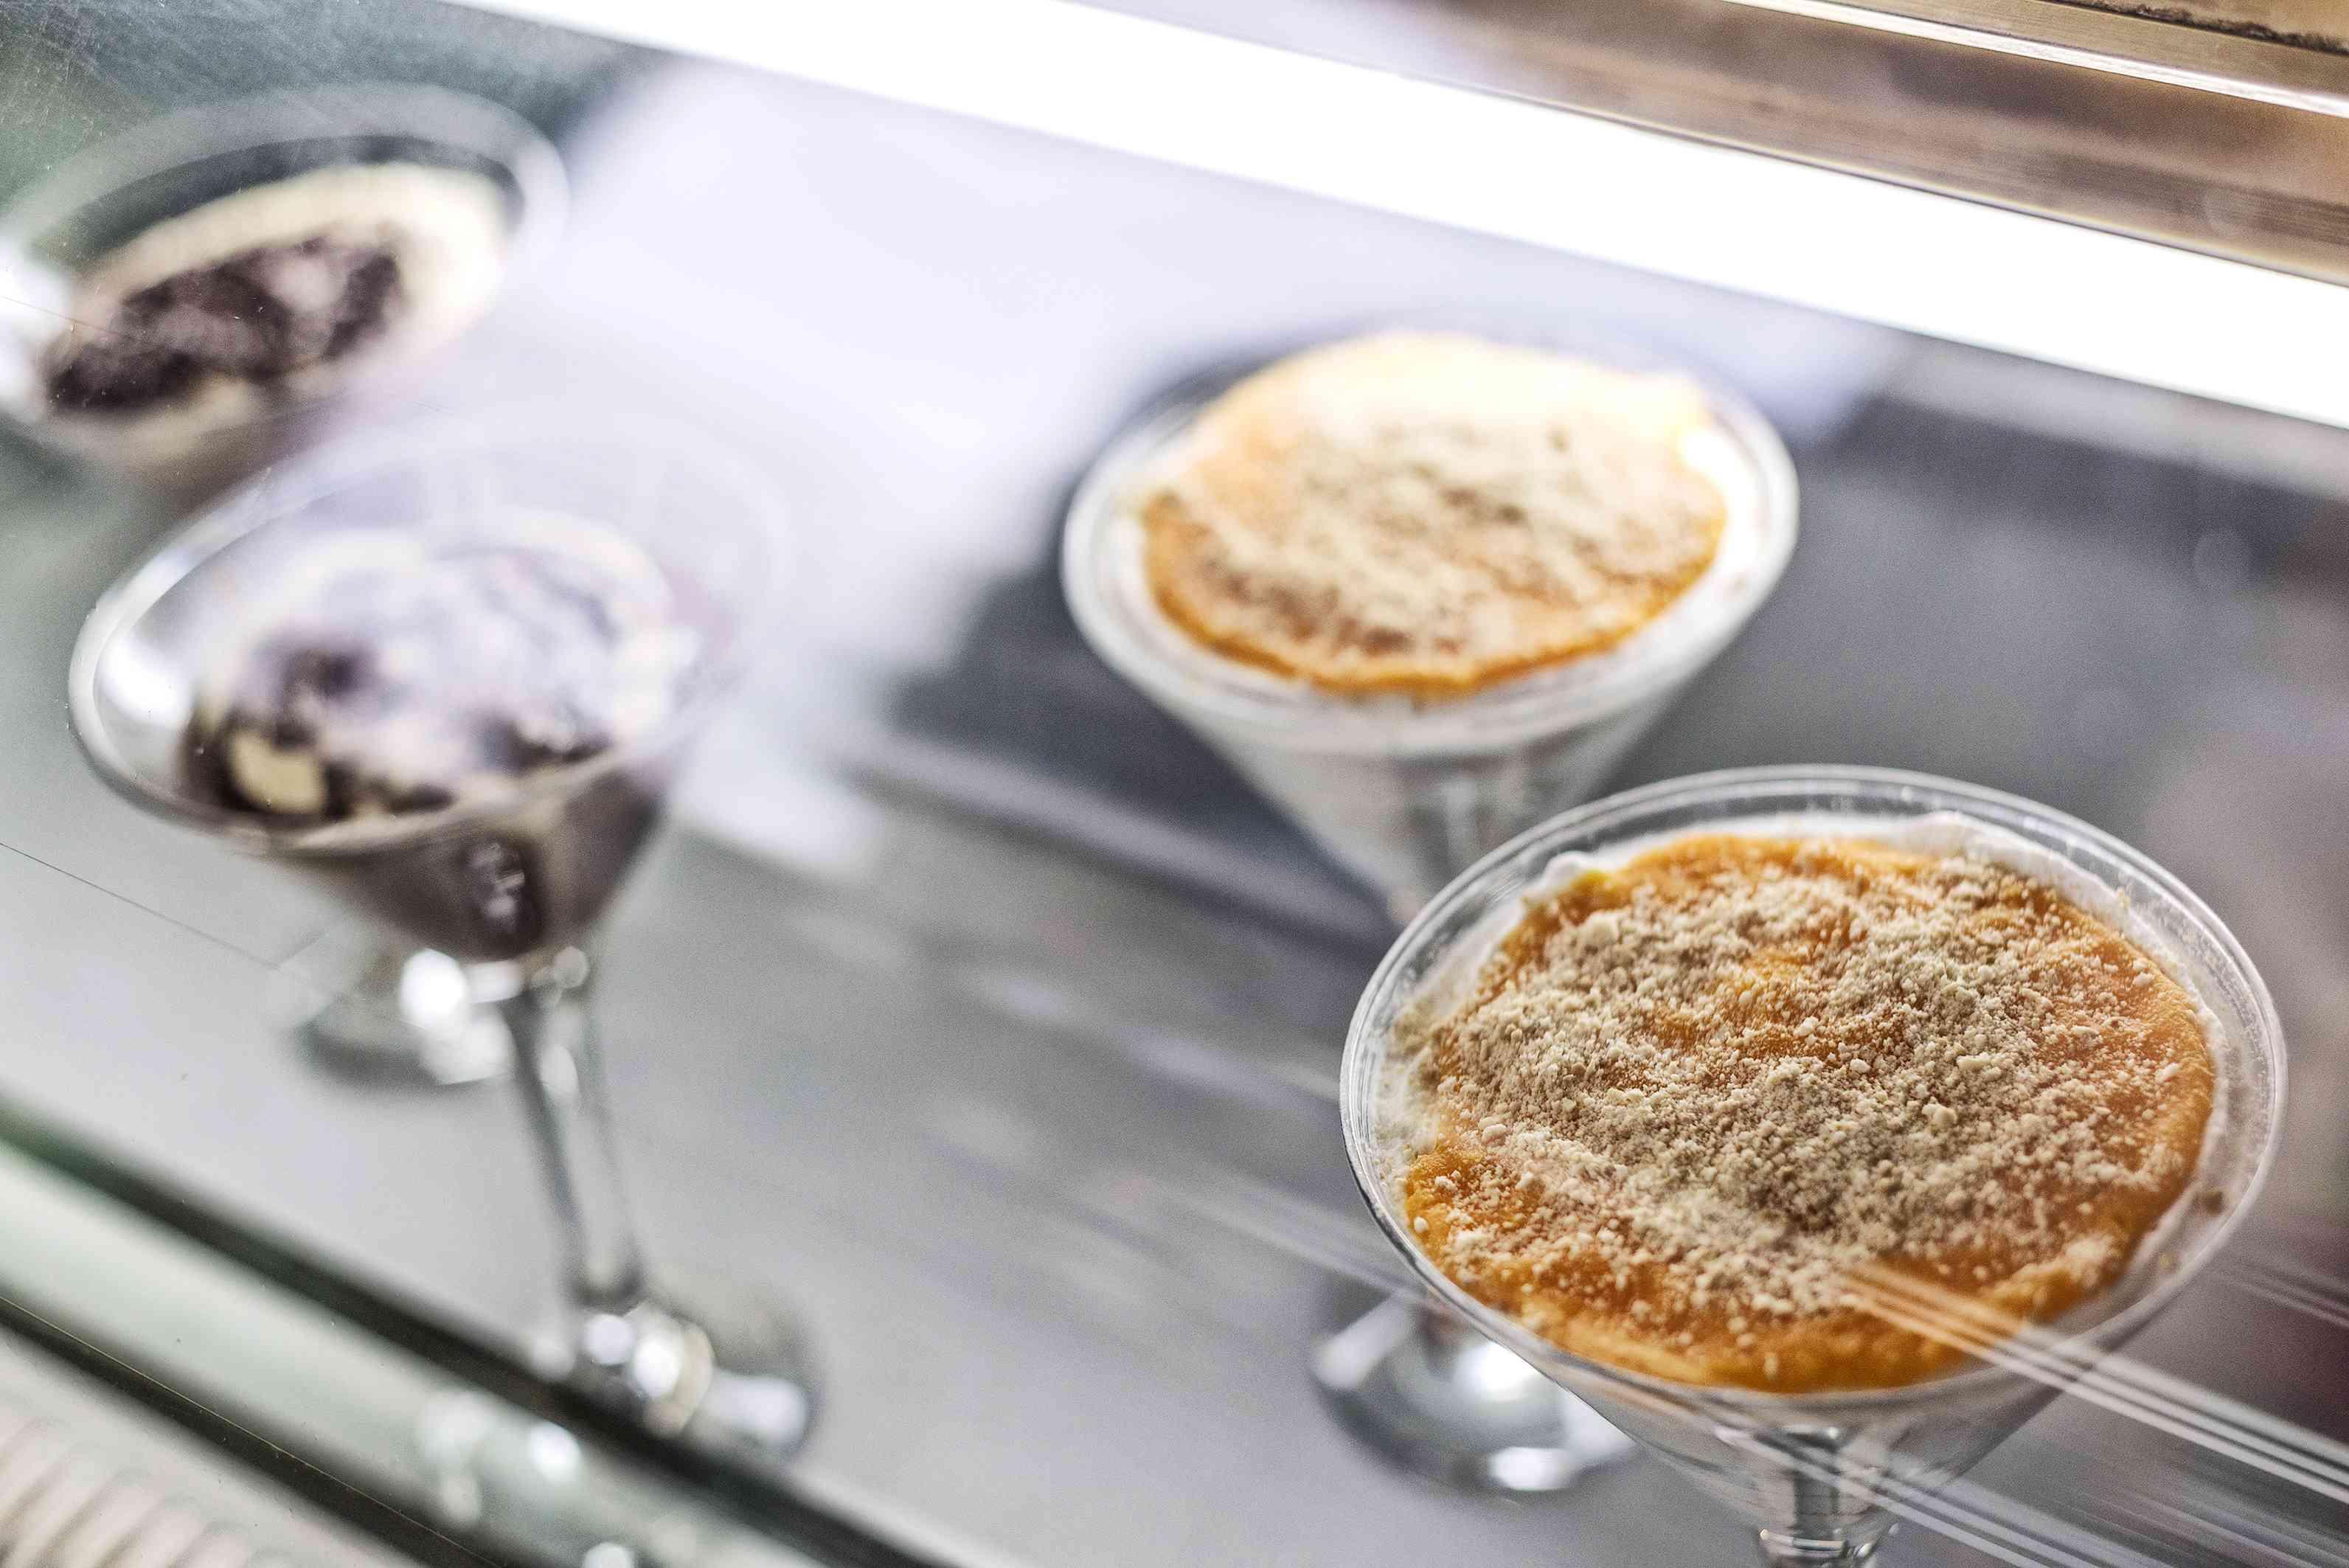 serradura famous traditional macau portuguese pudding sweet dessert